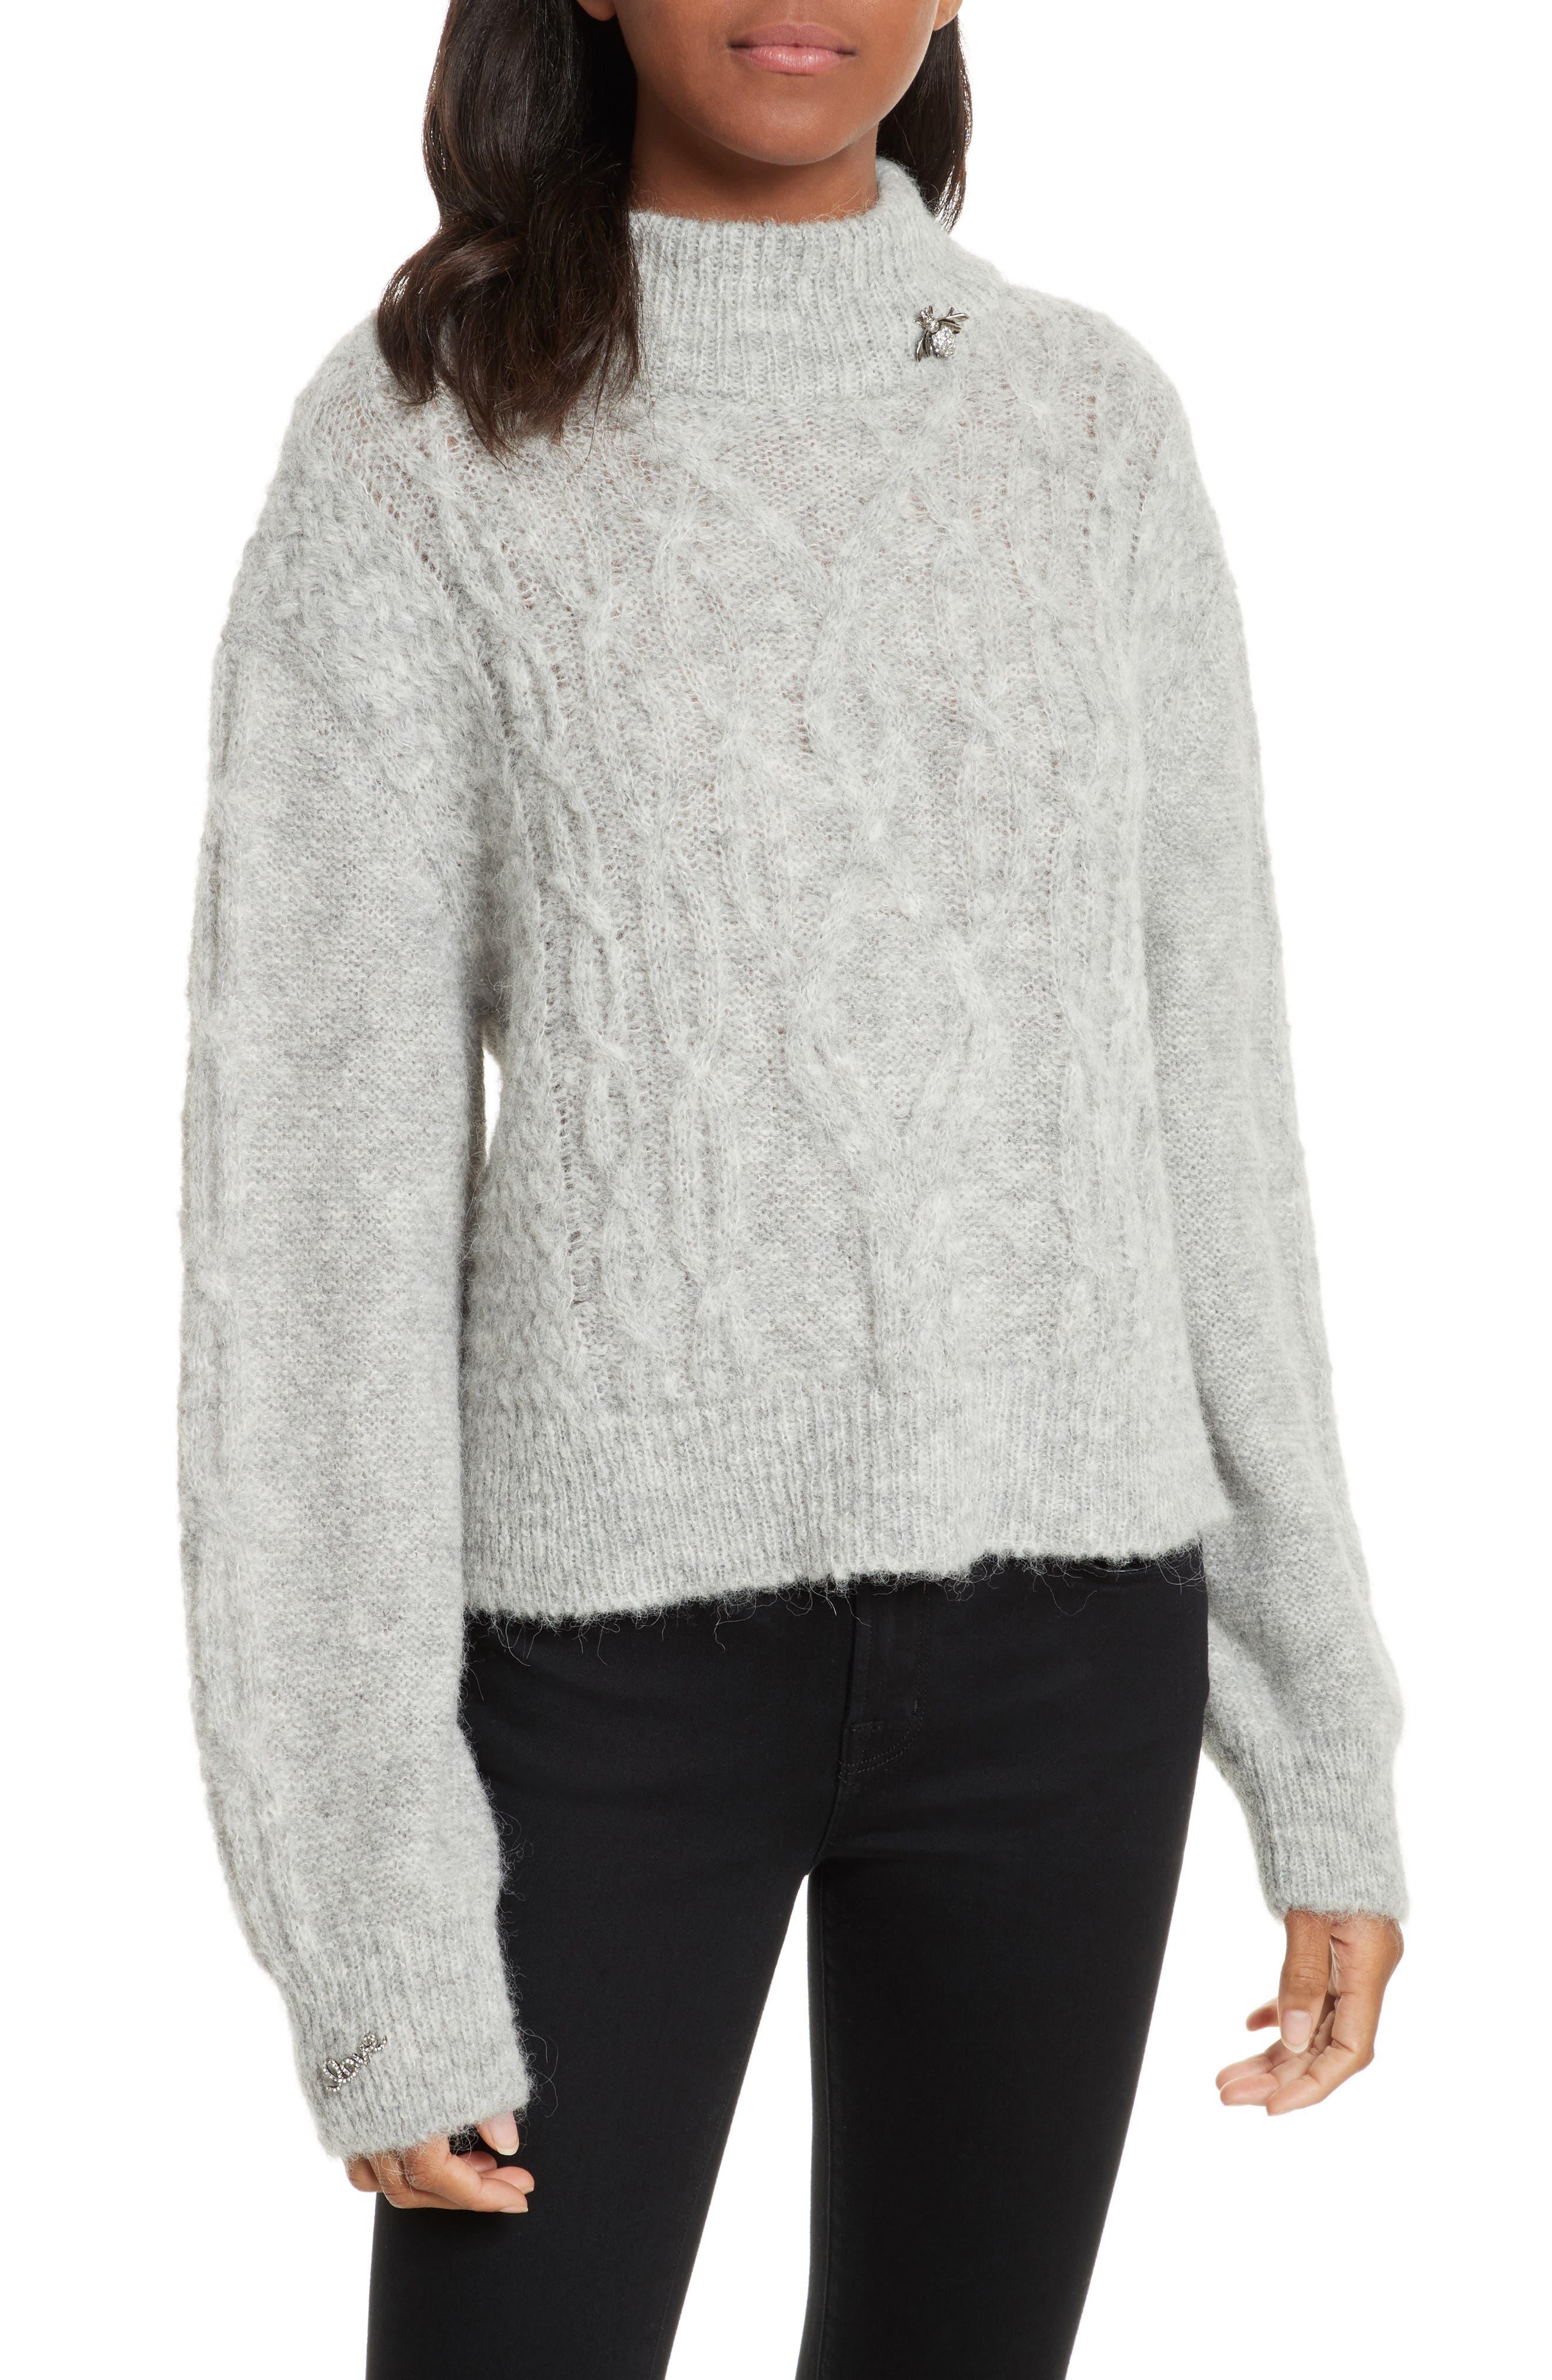 Garlan Mock Neck Sweater,                             Main thumbnail 1, color,                             051